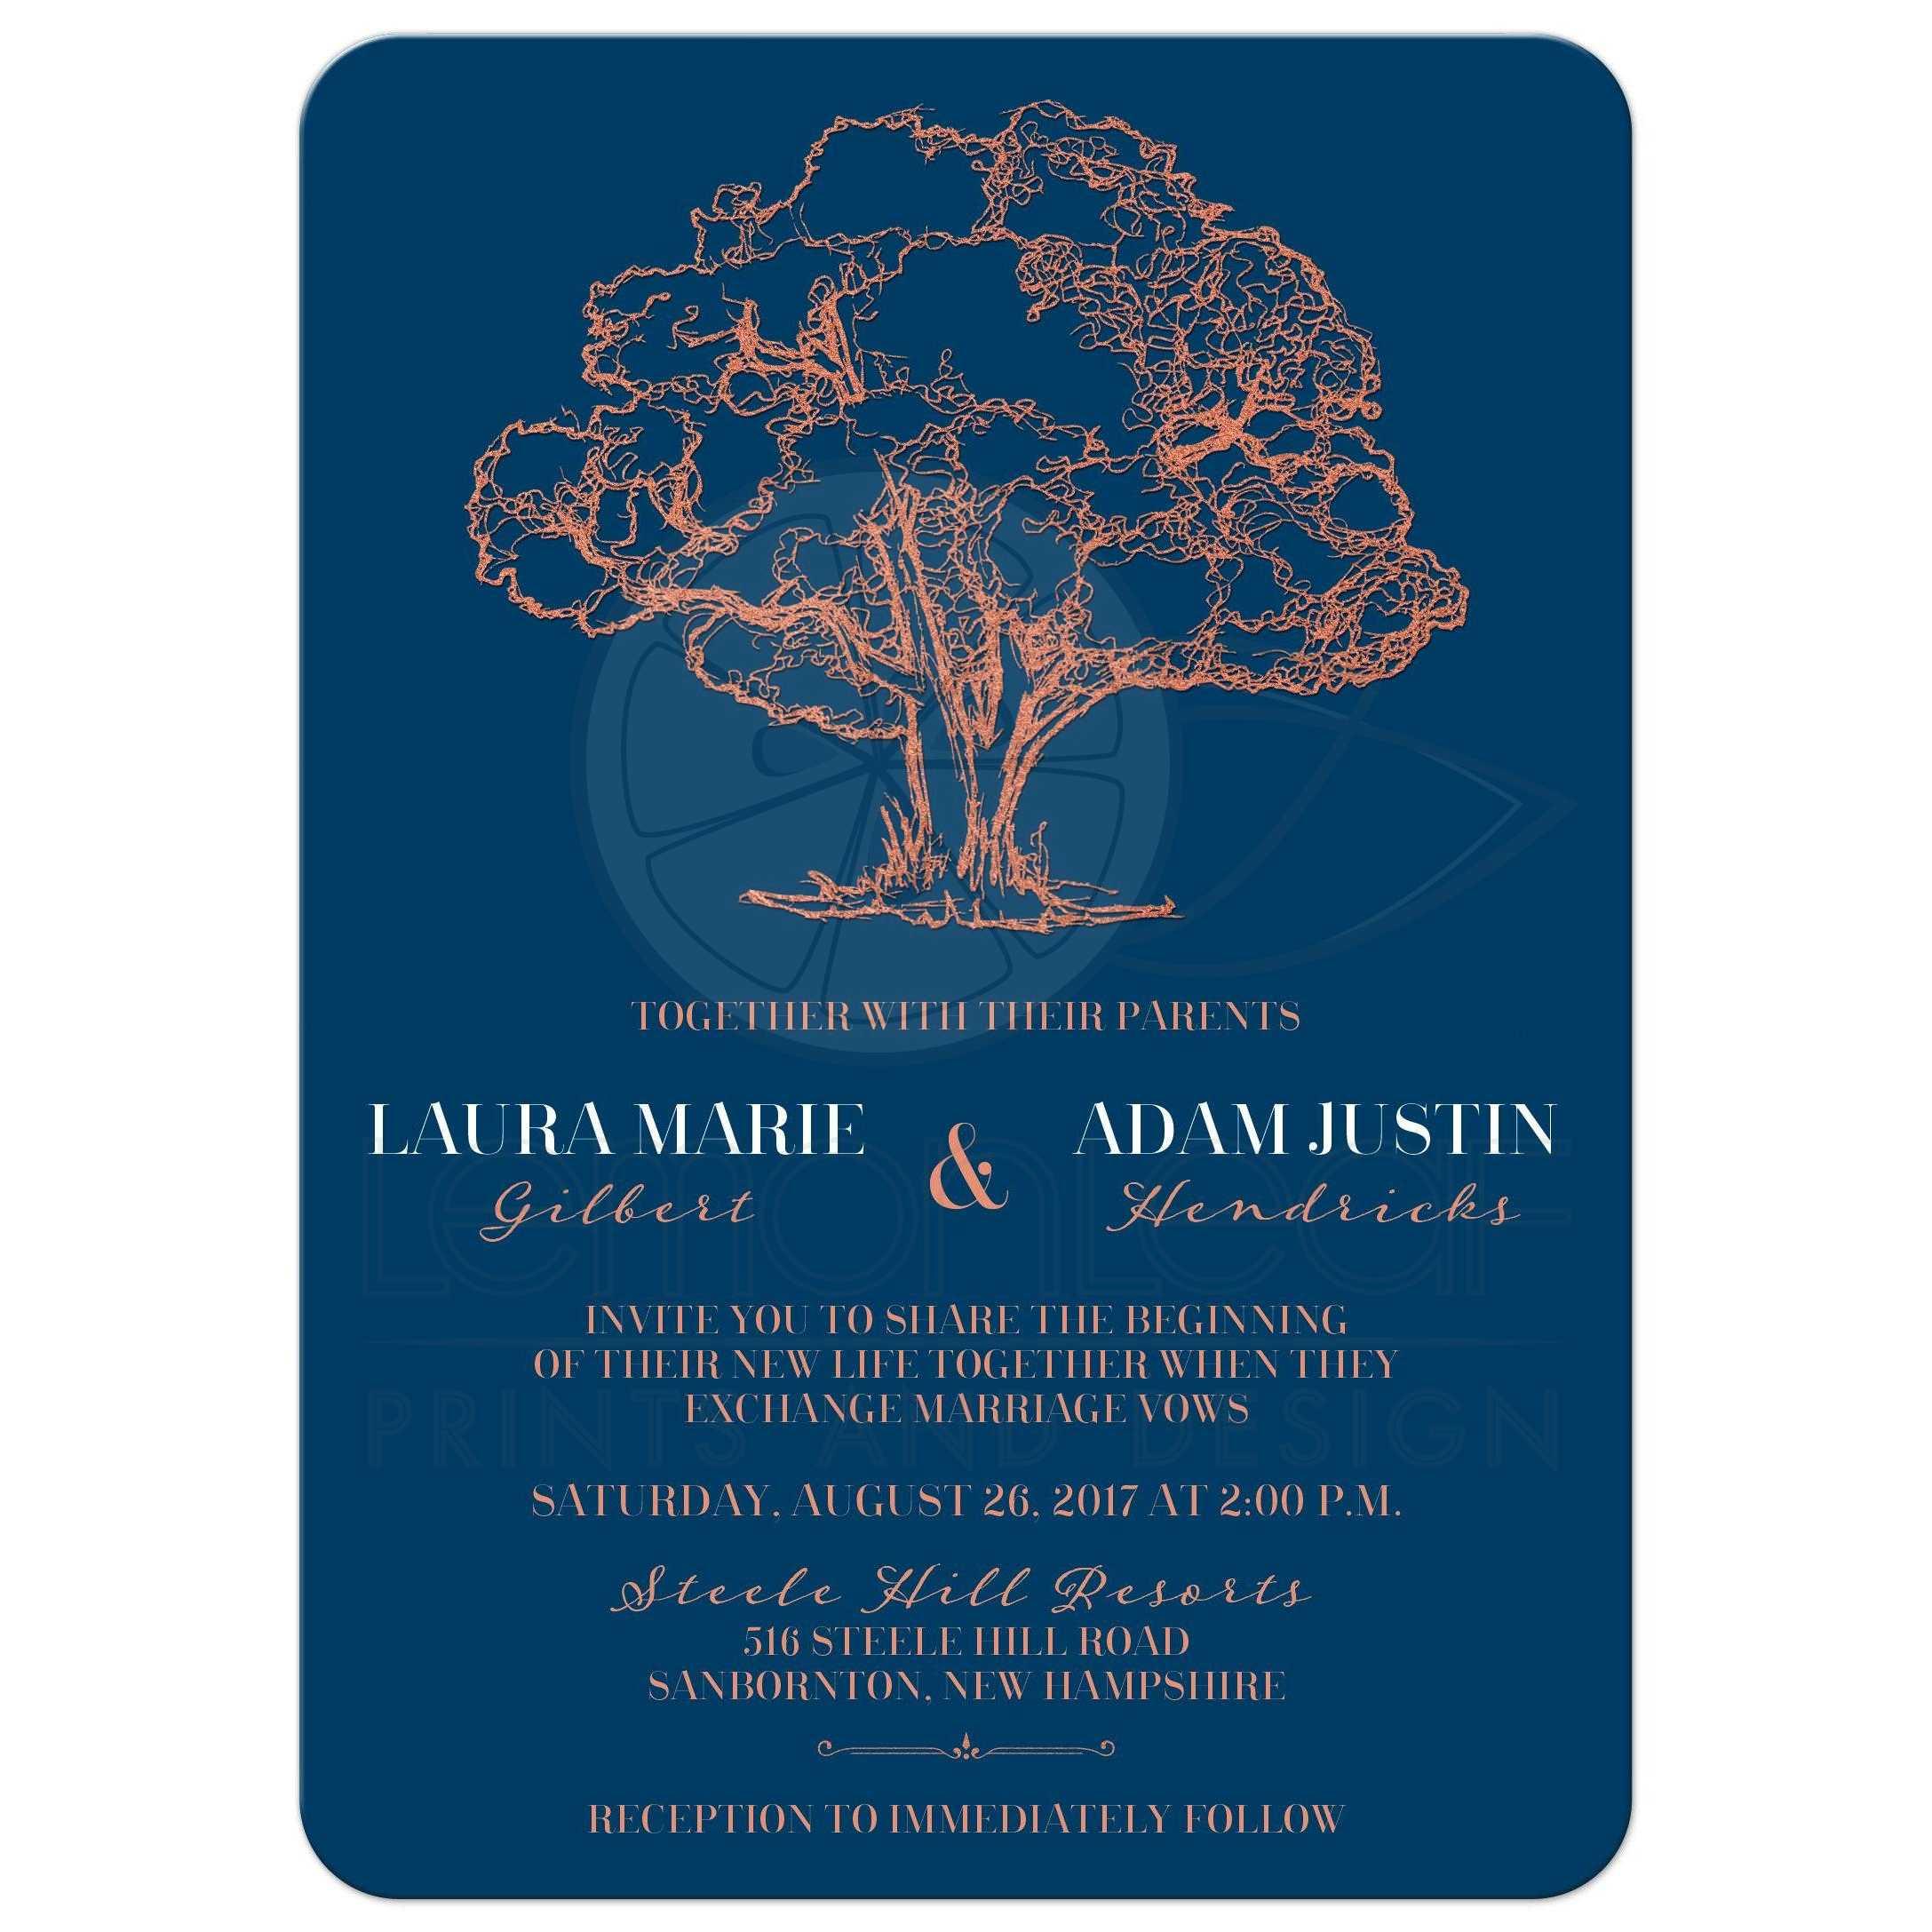 Navy Blue Wedding Invitations Modern: Modern Tree Illustration On Navy Blue Wedding Invitation